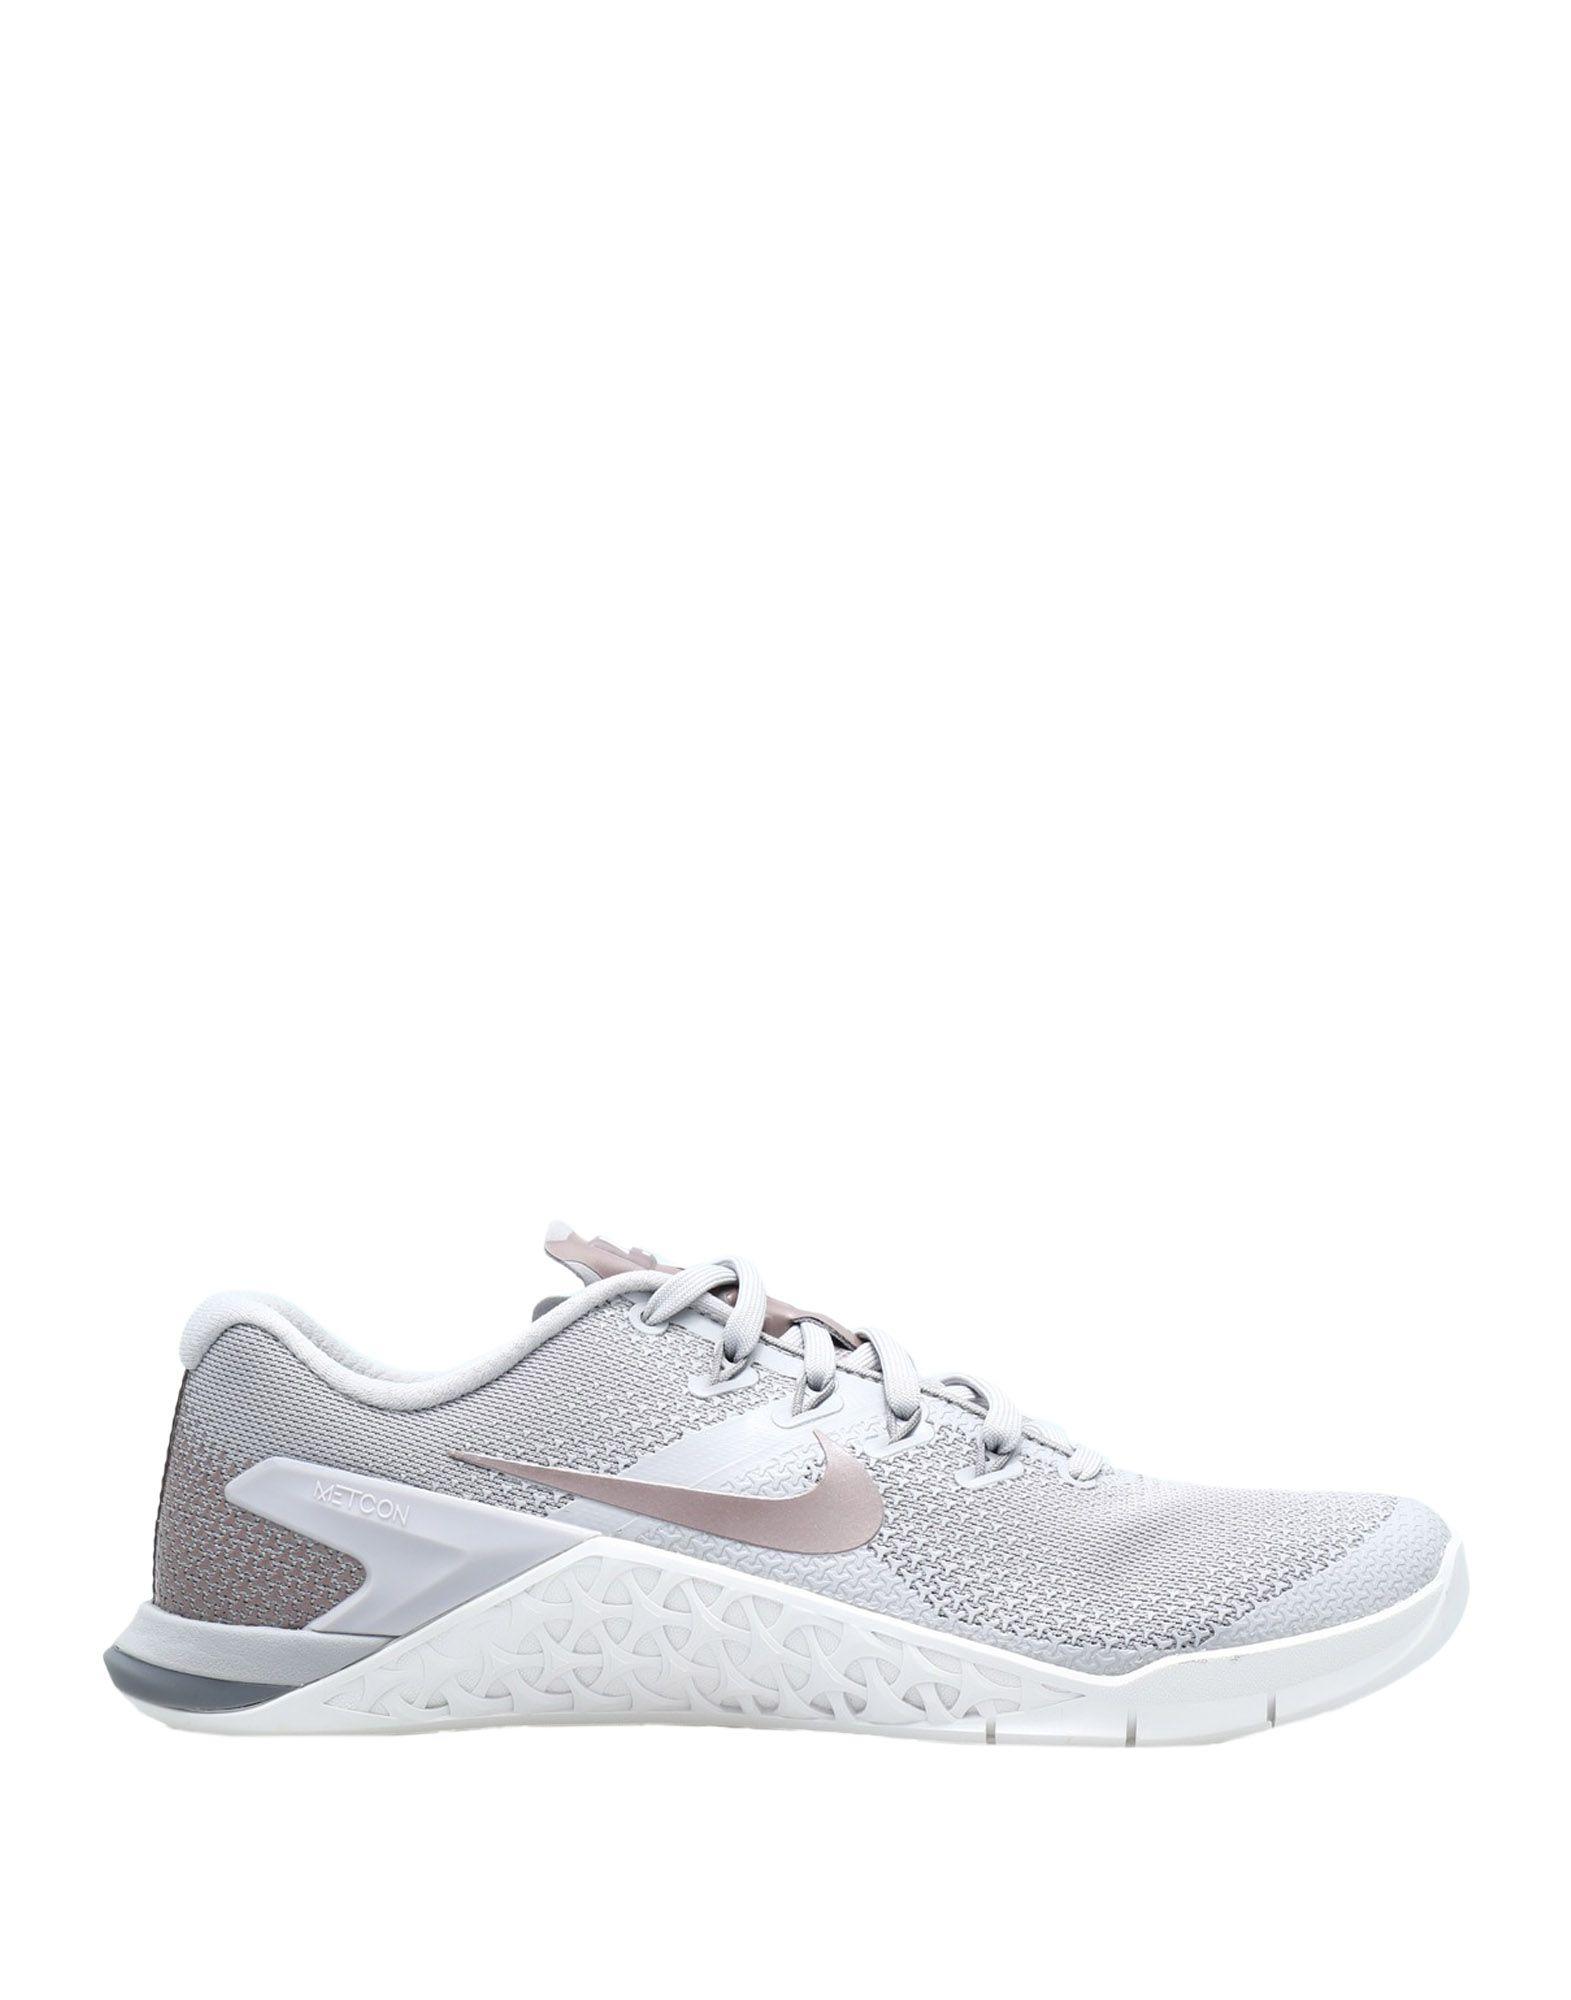 purchase cheap c8c22 e03a7 Baskets Nike Metcon 4 Lm - Femme - Nike Gris Remise de marque Baskets  nogotx1317-Baskets - strap.lonestar.space